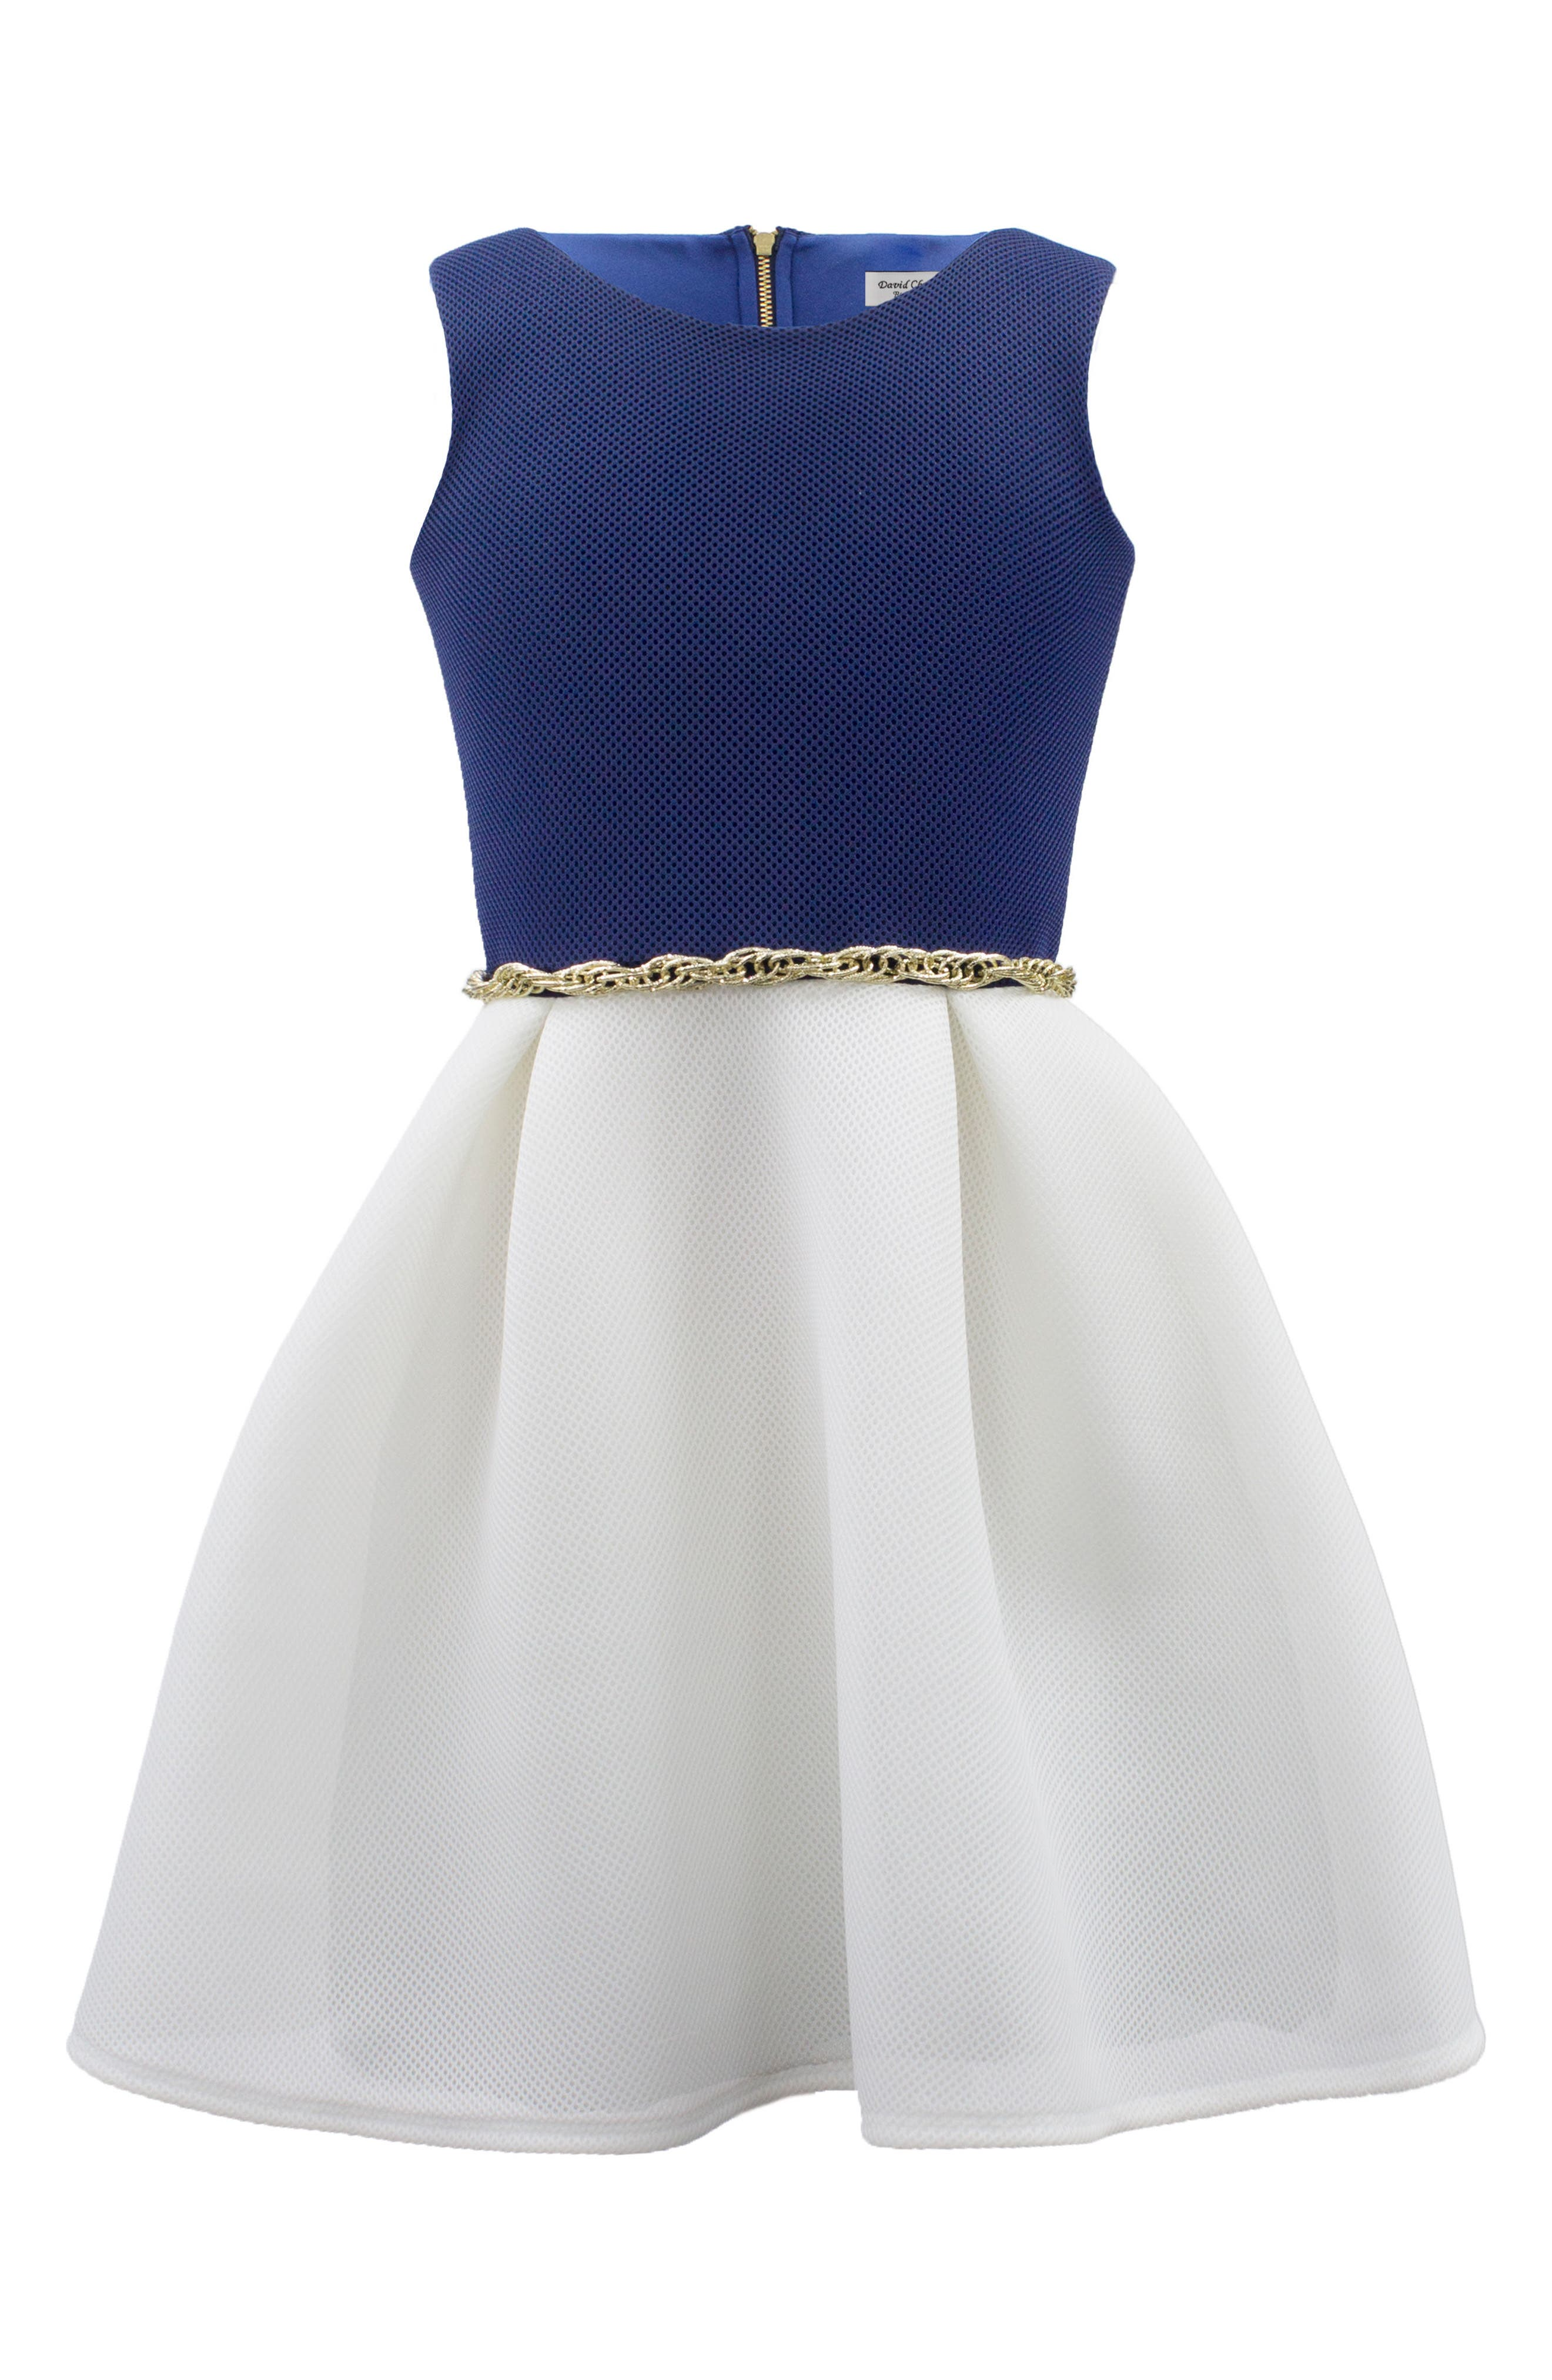 Colorblock Mesh Dress,                         Main,                         color, Navy/ Ivory